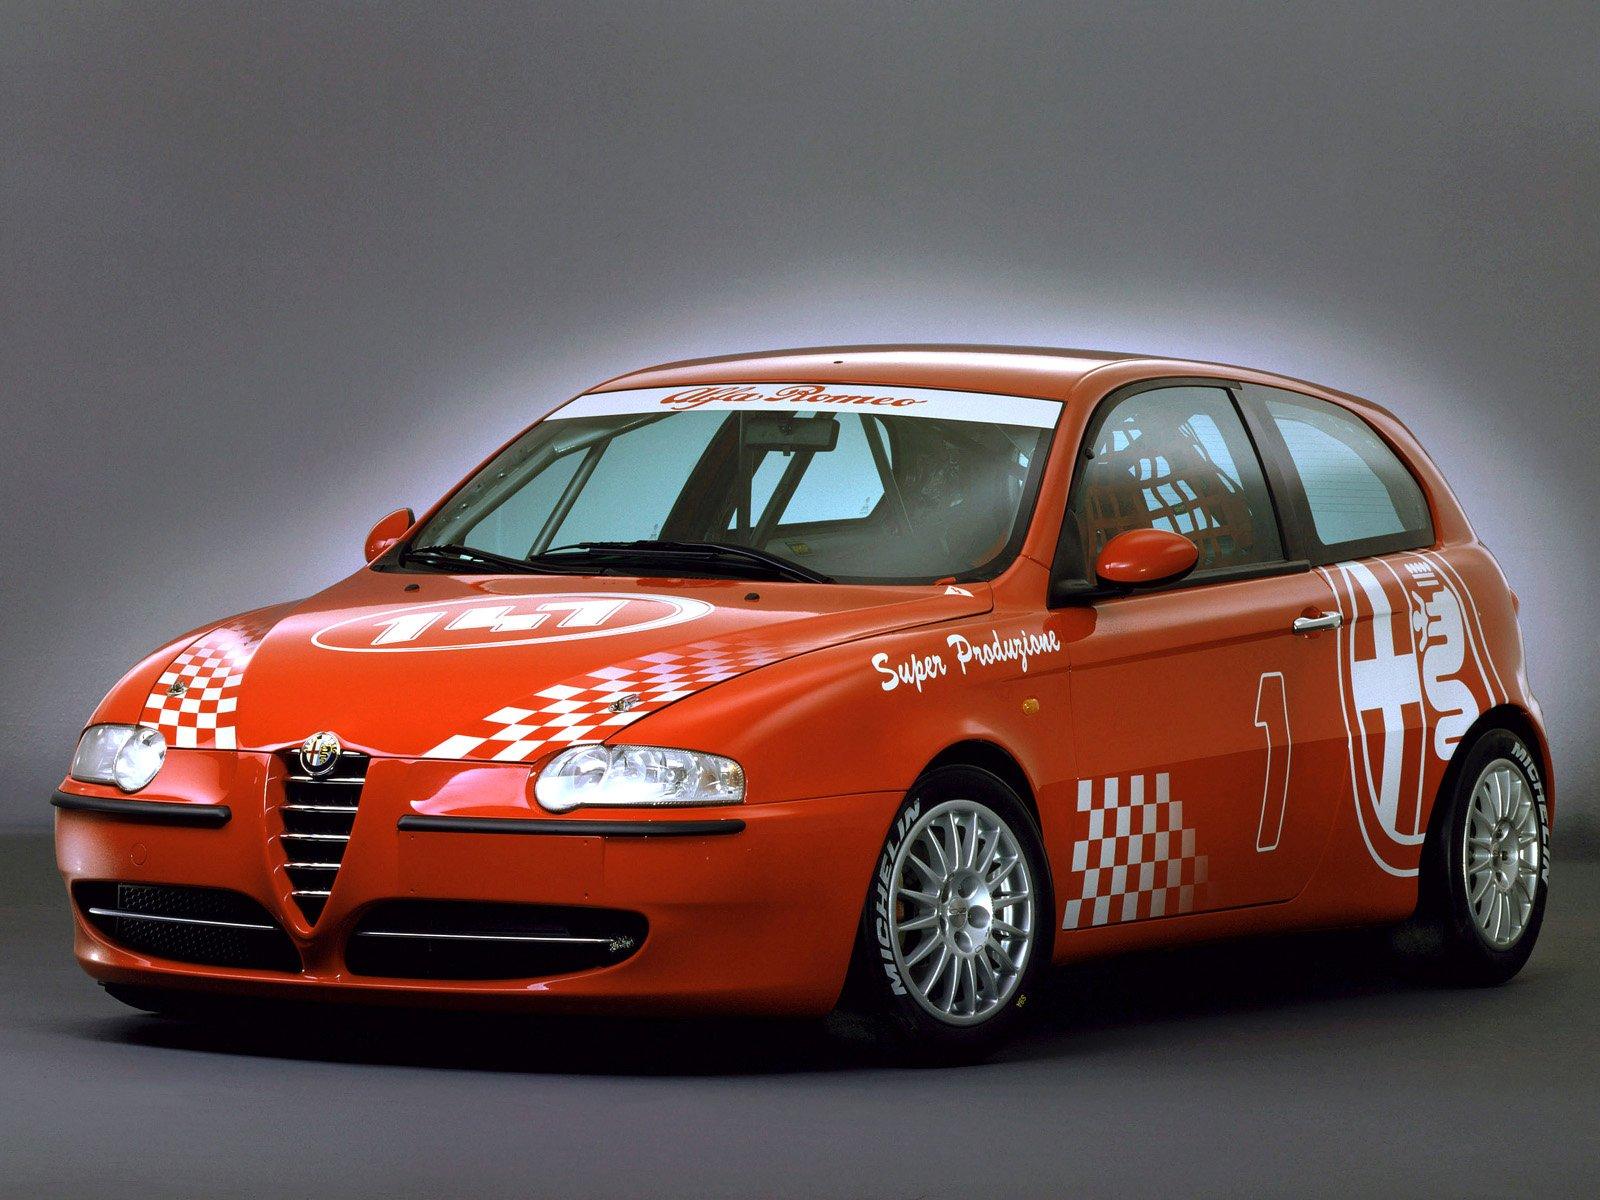 Alzado Frontal Coche Audi A3 as well Kuvia in addition Alfa Romeo Motorsport 001 as well File Fiat Punto 2012  Alfa Romeo 147  Fiat Punto Evo  Lancia Y together with AlfaGiul 1. on alfa romeo 147